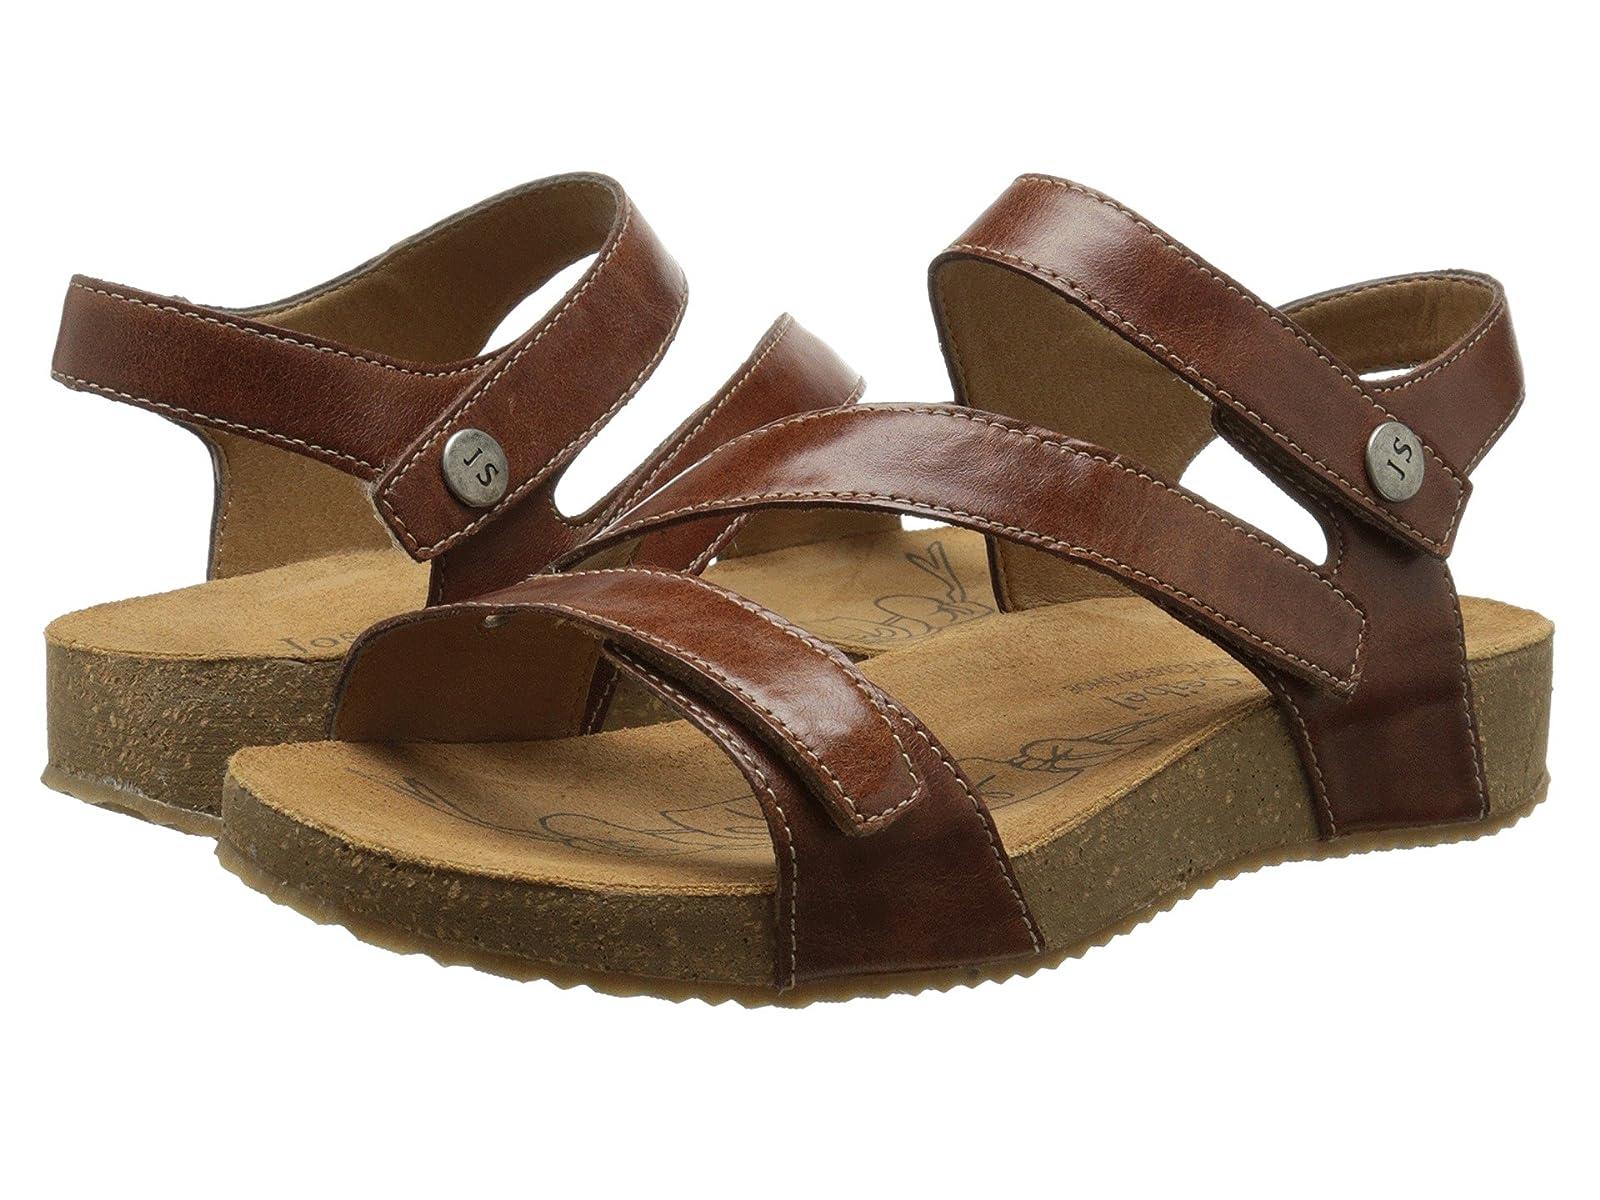 Josef Seibel Tonga 25Atmospheric grades have affordable shoes